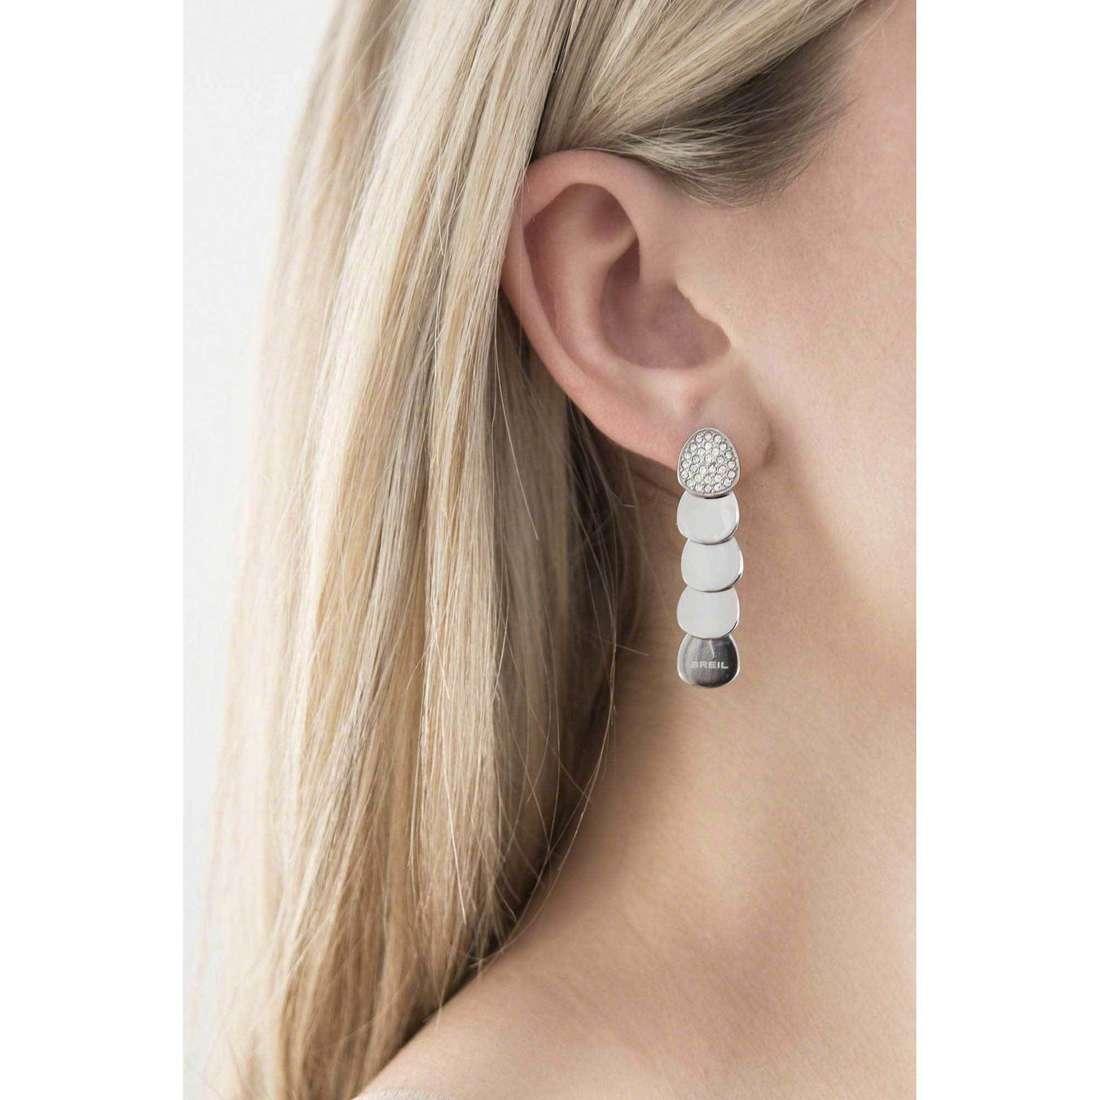 Breil boucles d'oreille Gipsy femme TJ1567 indosso